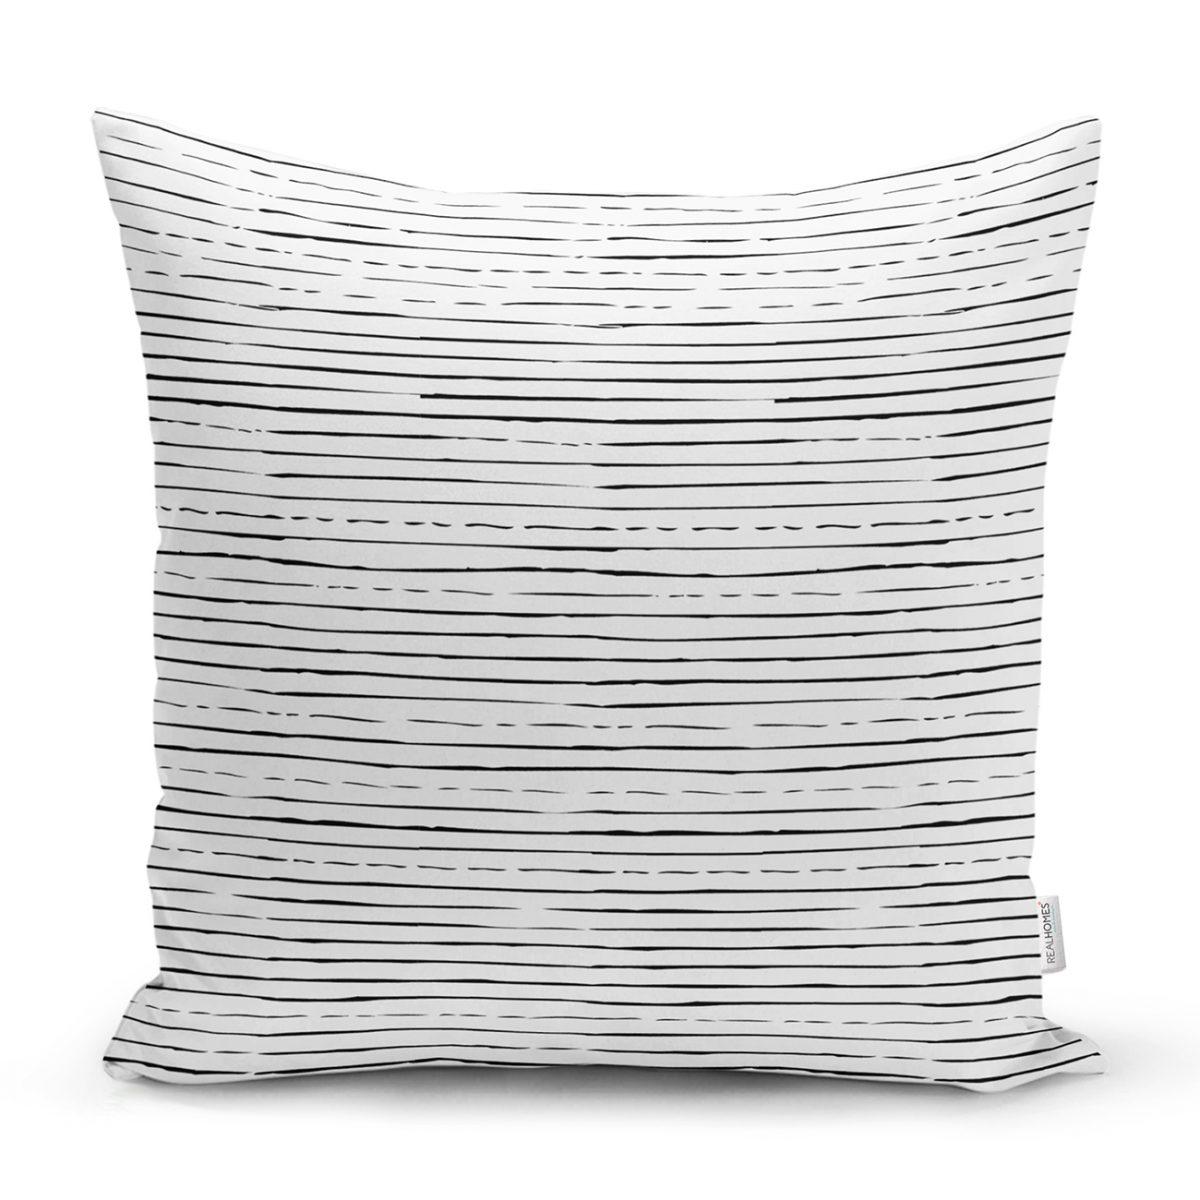 Modern Siyah Beyaz Çizgi Motifli Dekoratif Kırlent Kılıfı Realhomes